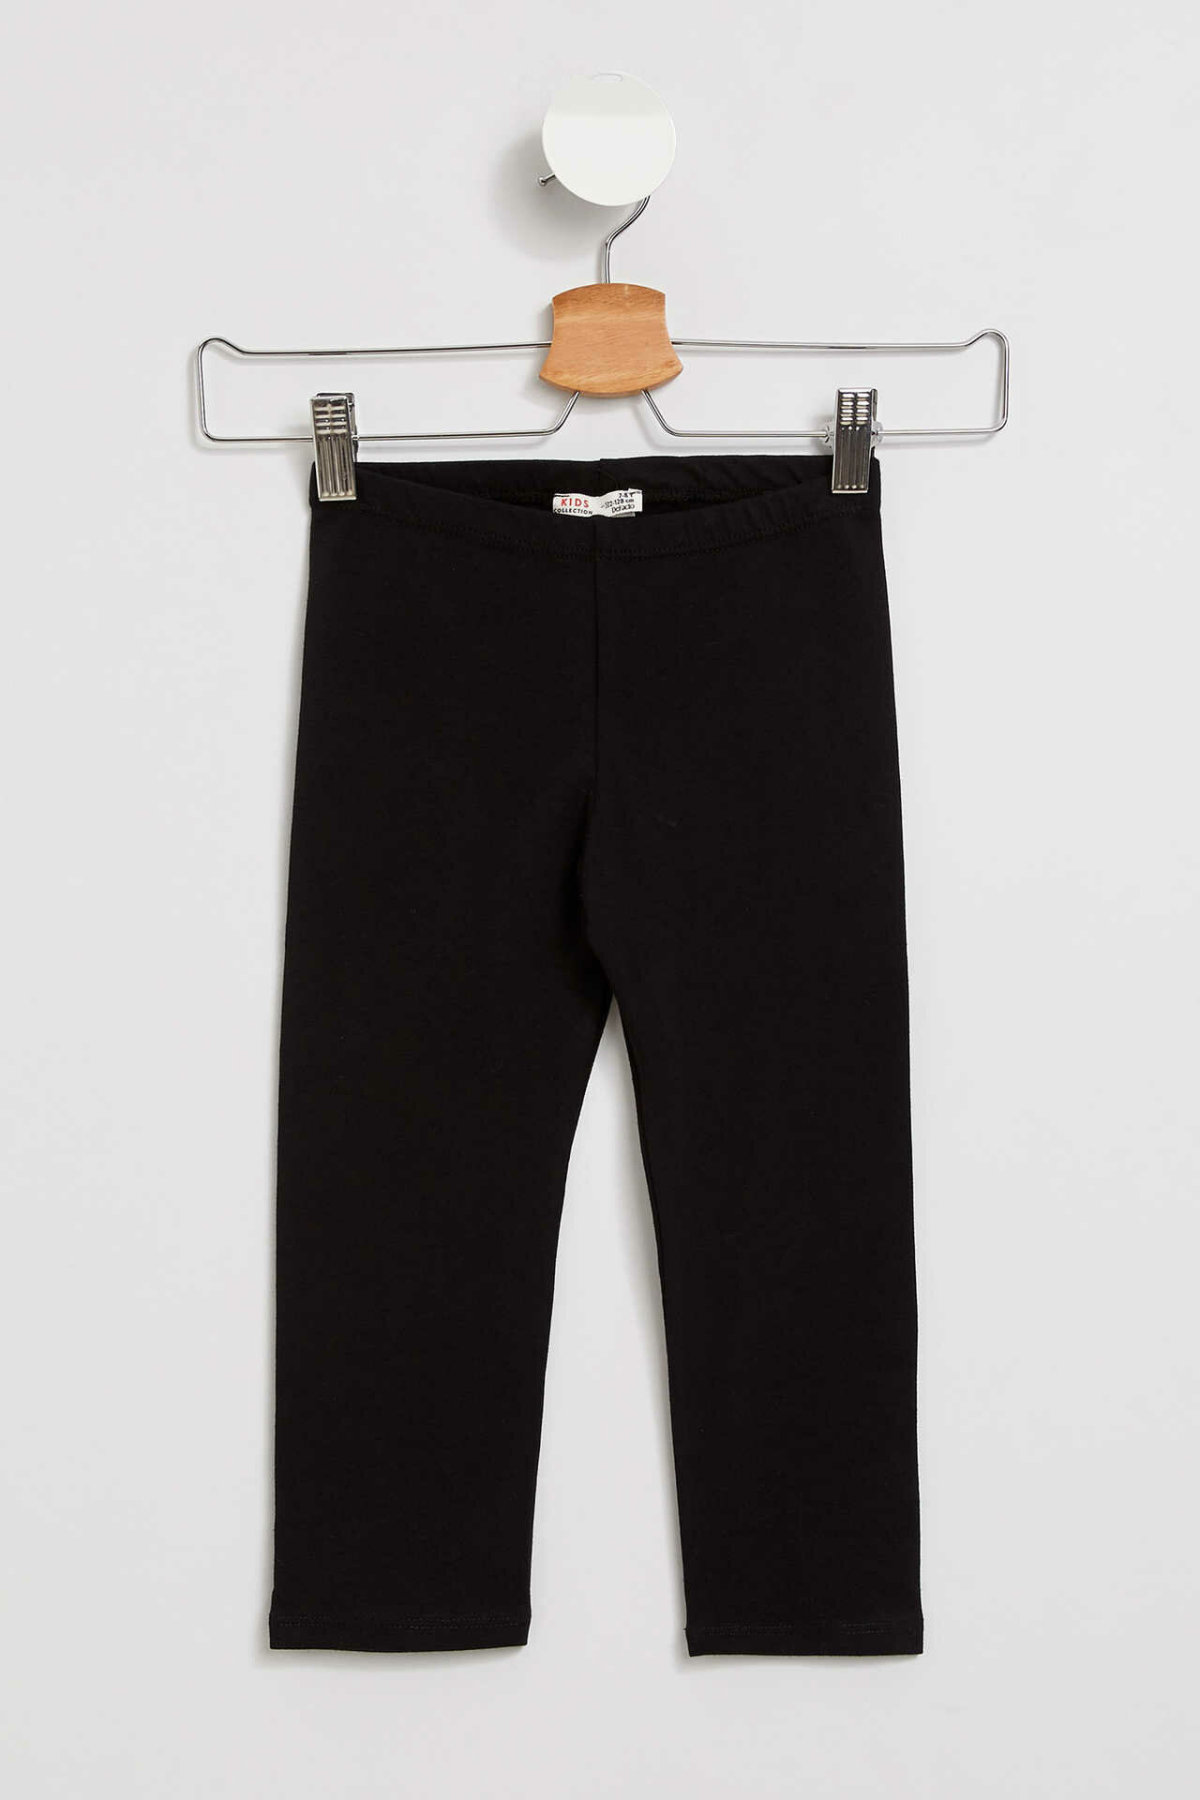 DeFacto Girl Summer Long Pants Kids Black Long Fit Leggings Girls Elastic Legging Pants-J0128A619SM